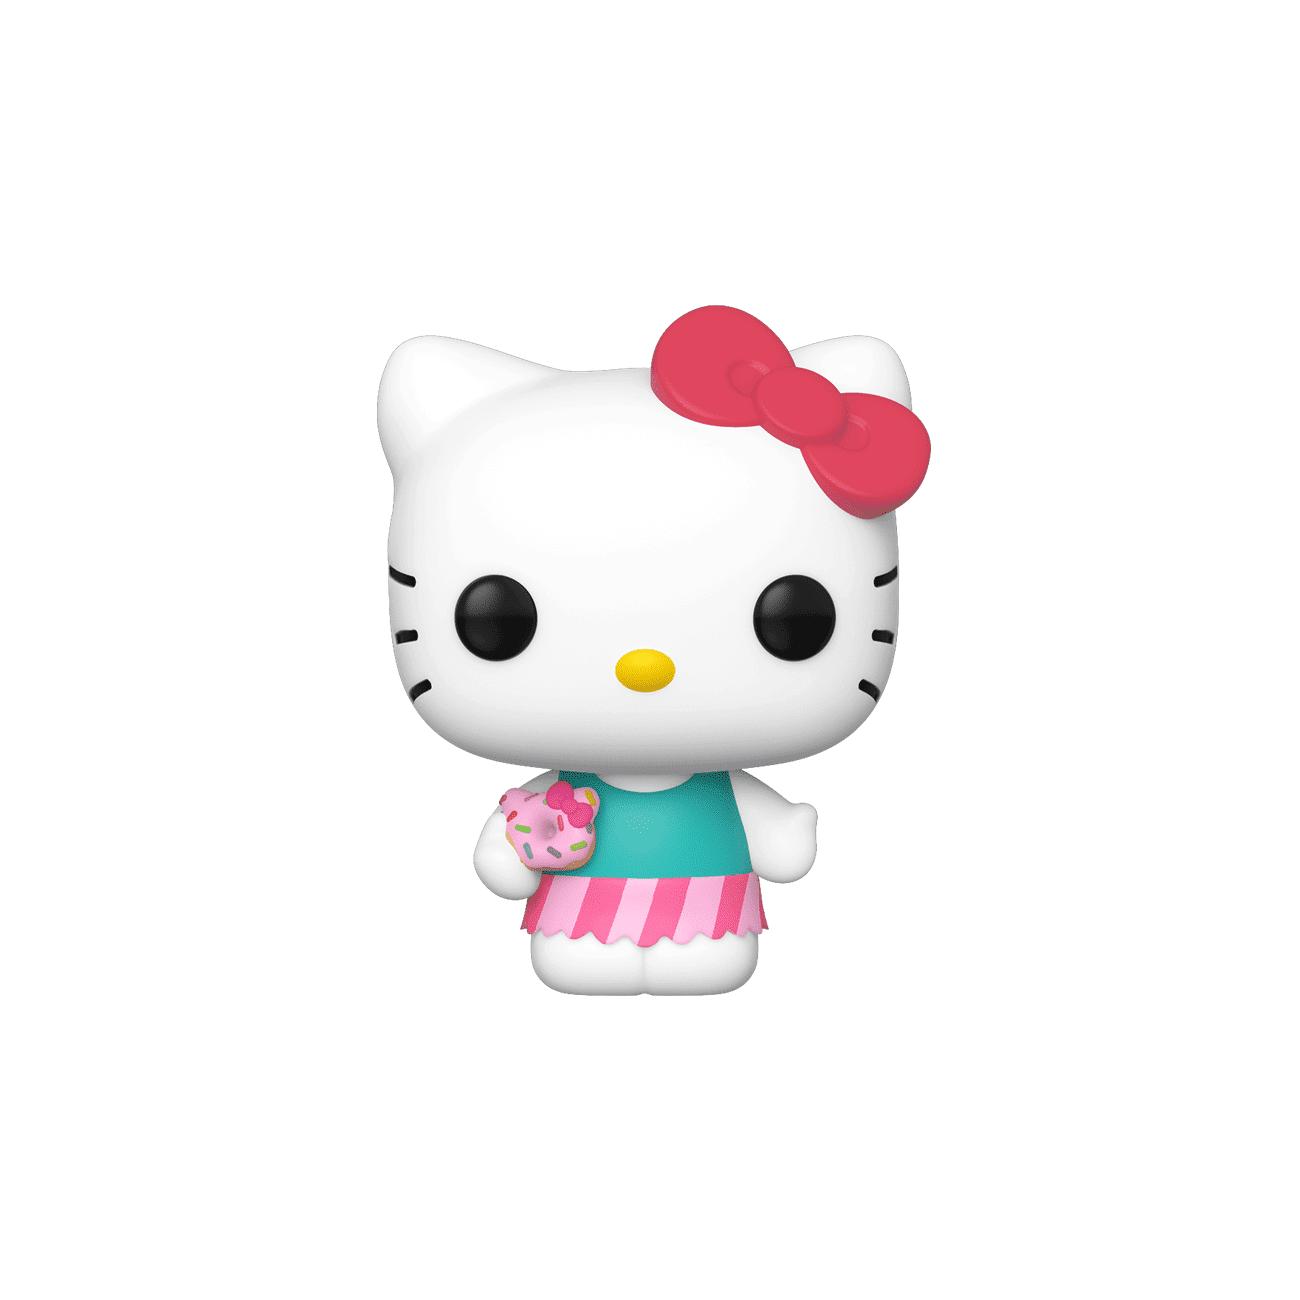 Pop! Vinyl Figurine Pop! Hello Kitty Sweat Treat - Sanrio